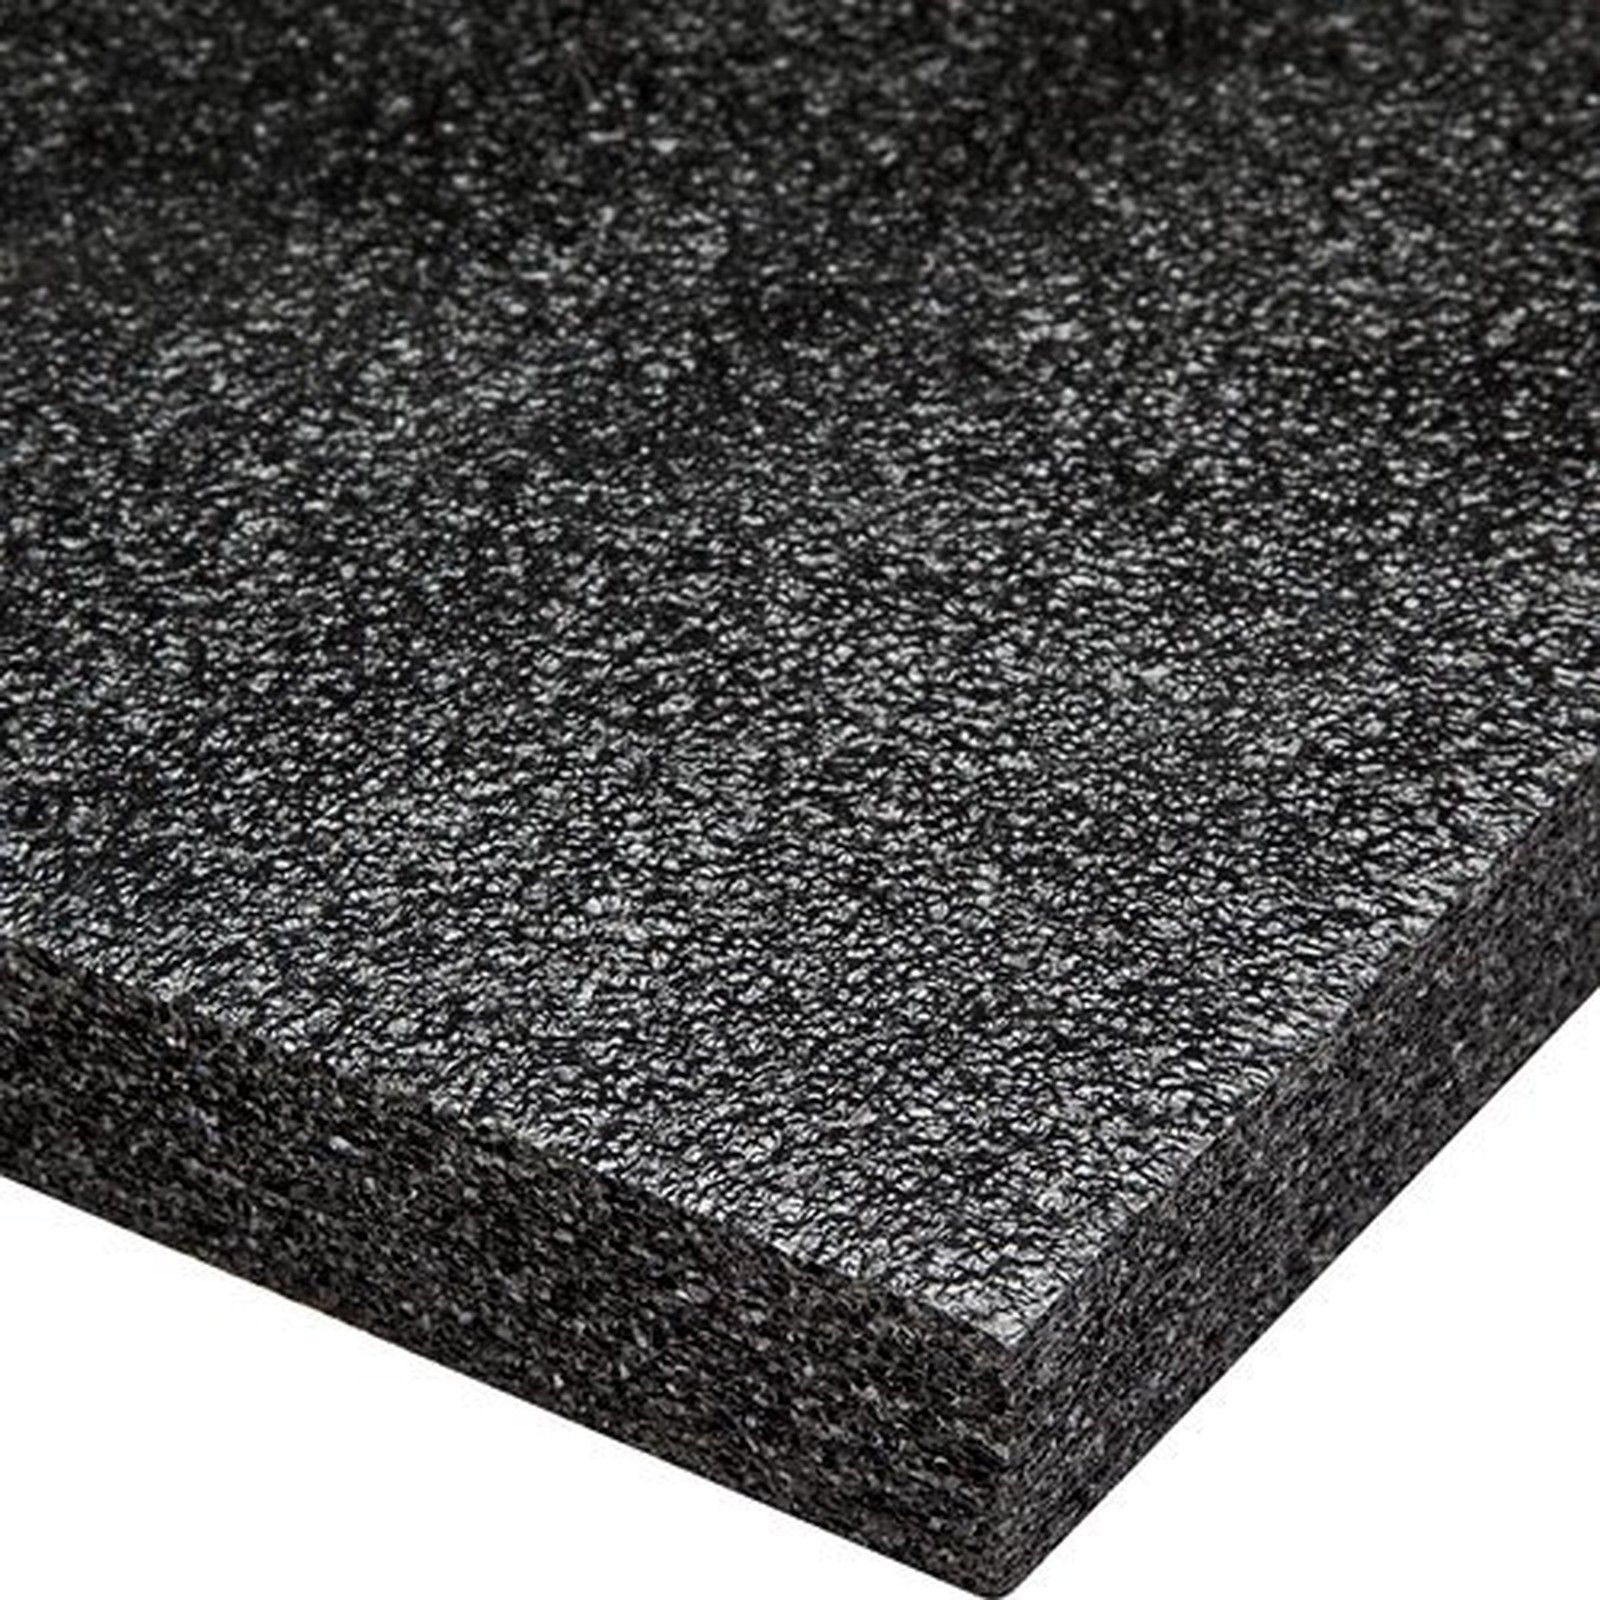 fastcap kaizen foam various thickness 2 x 4 black white black